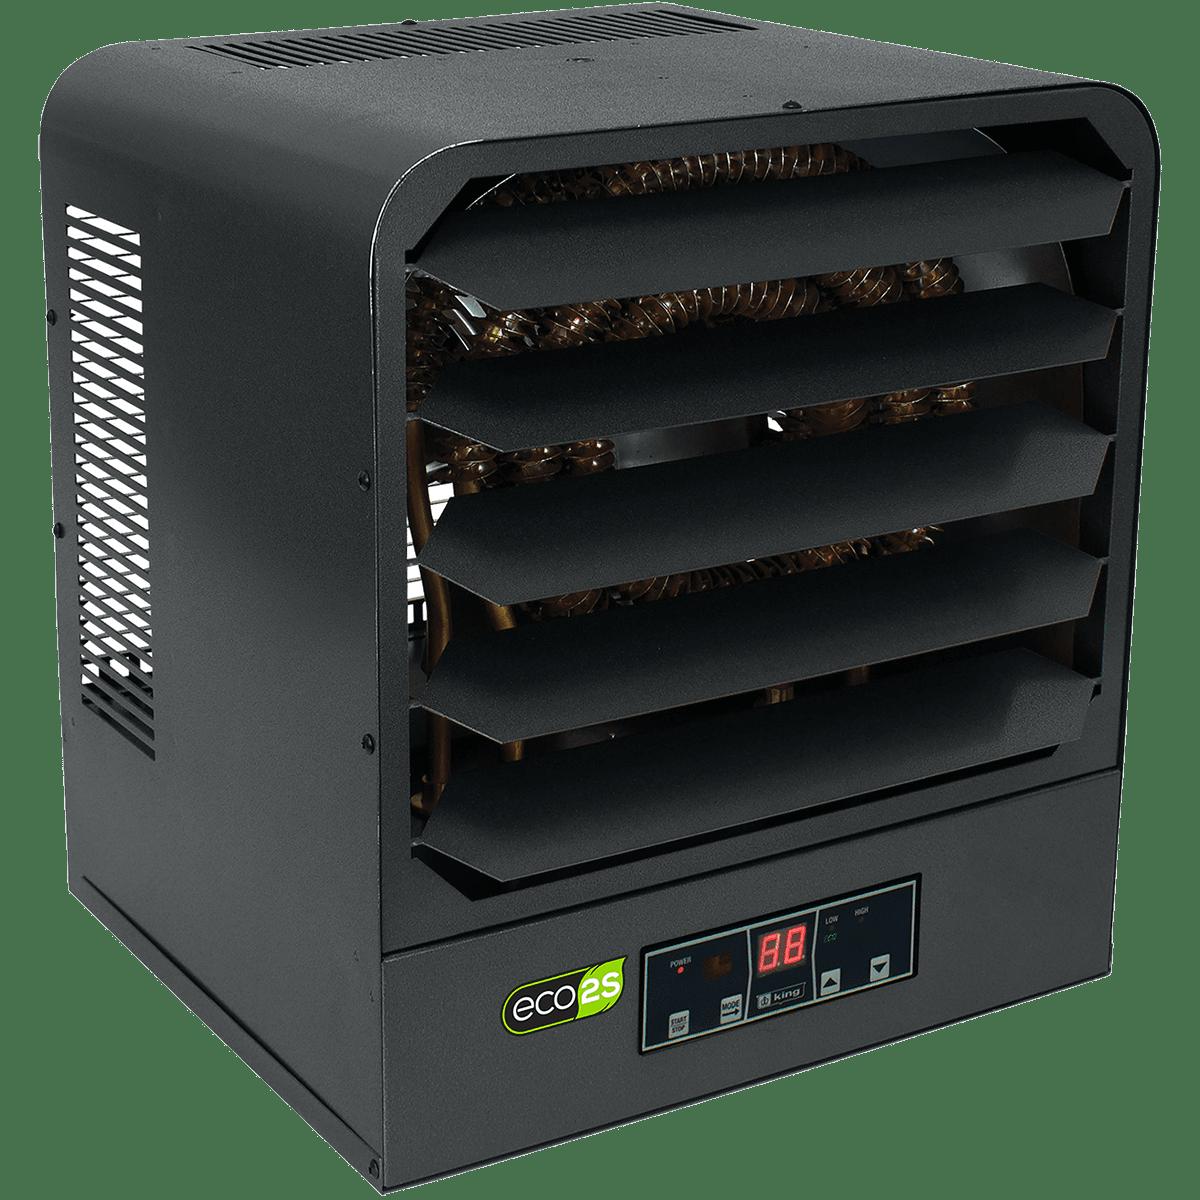 King Electric KB ECO2S Series 5000W Garage Heater Model: KB2405-1-B2-ECO